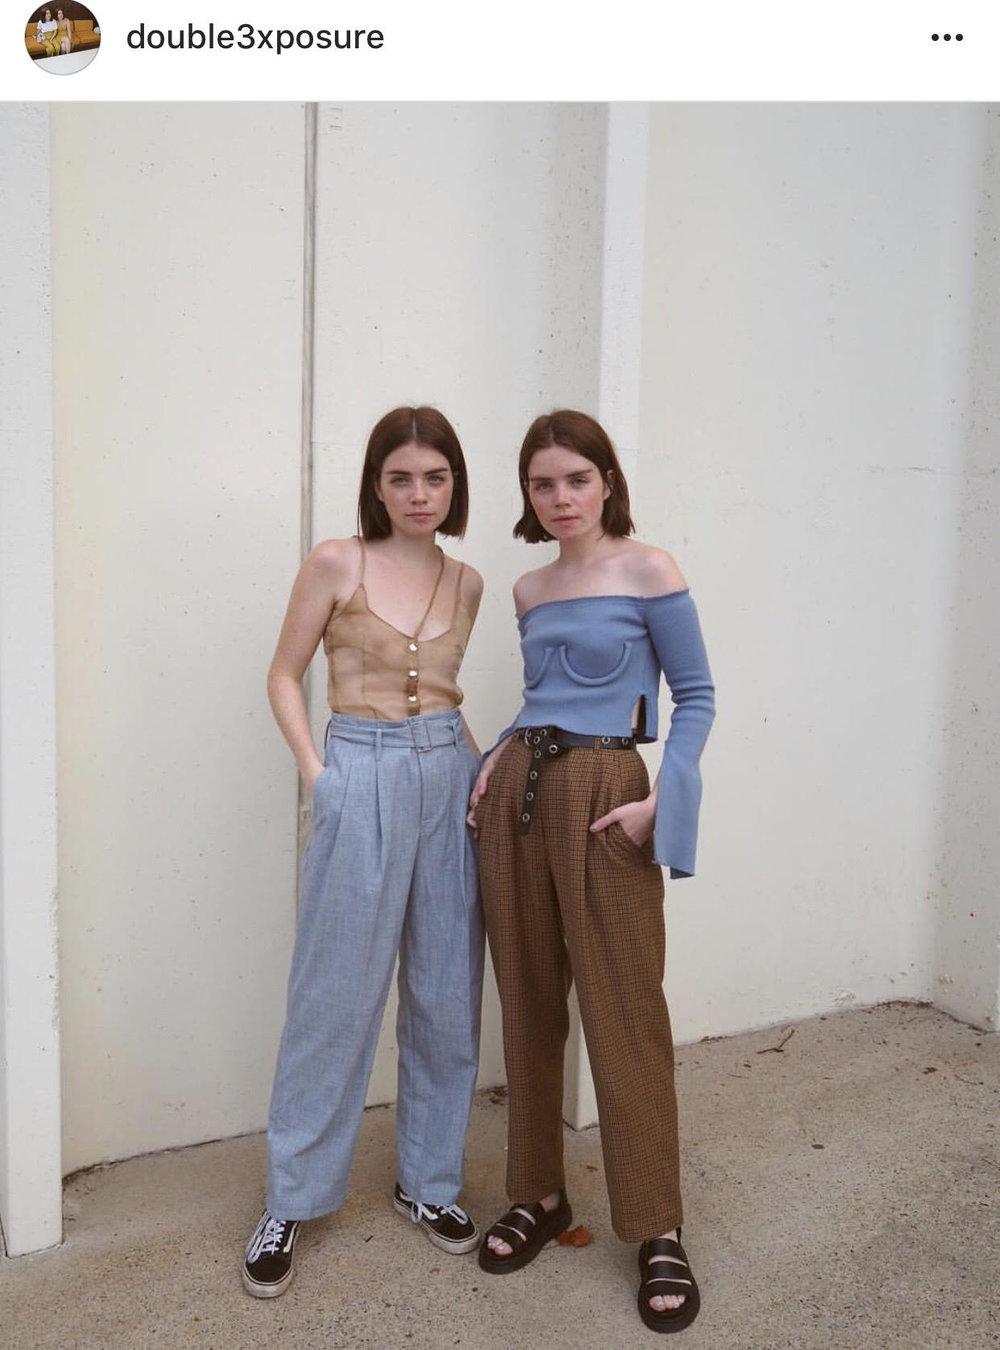 twins-double3x.jpg